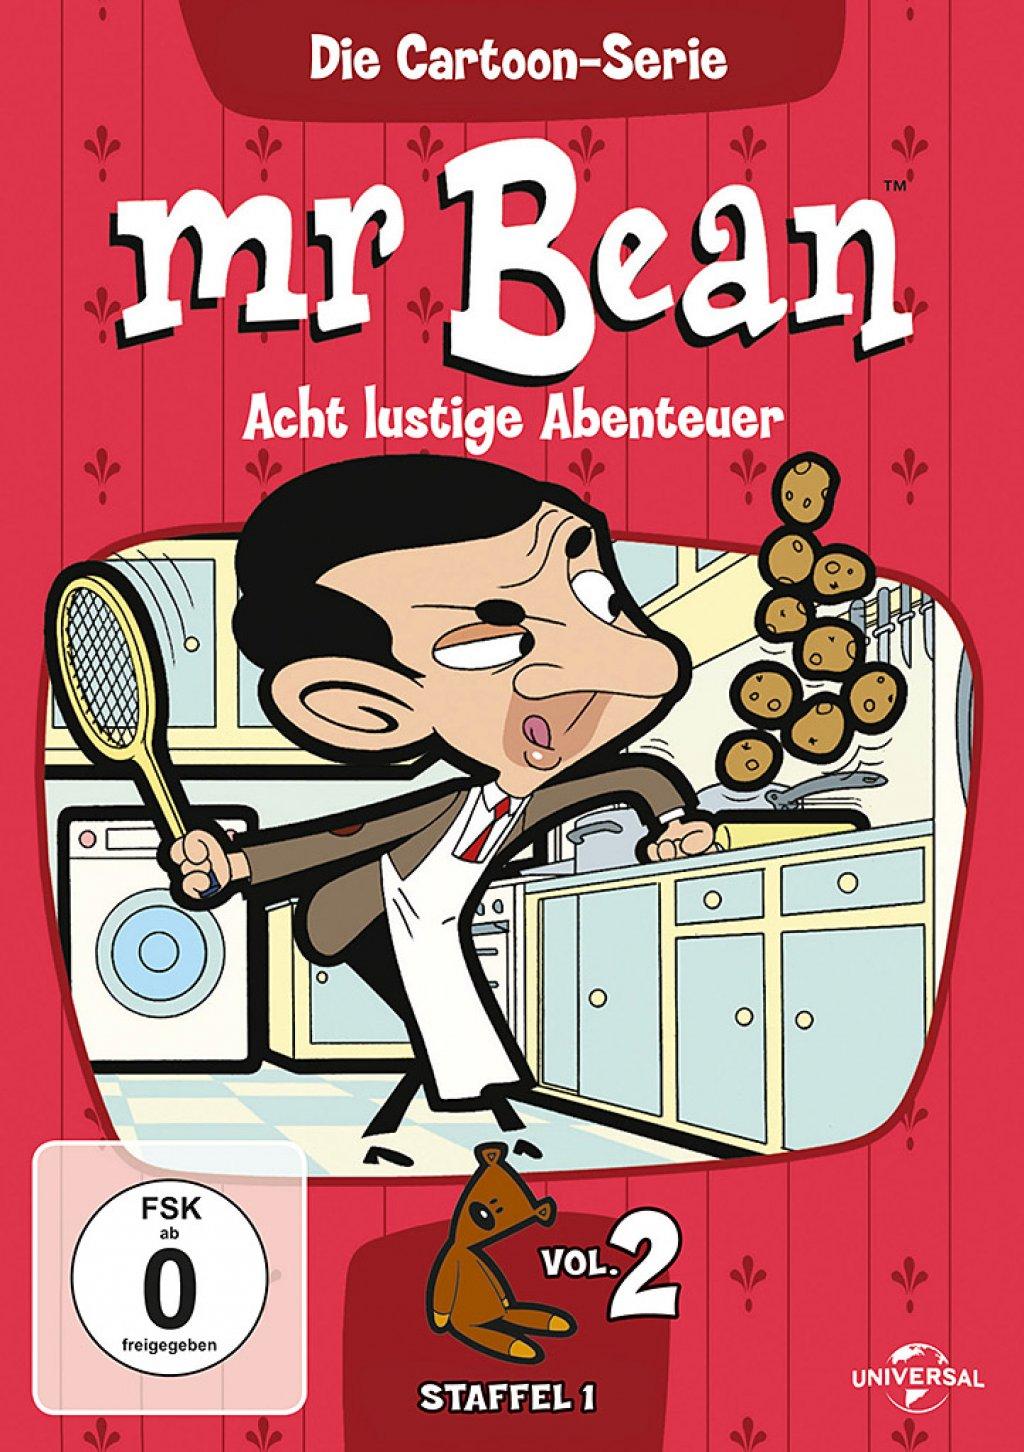 Mr. Bean - Die Cartoon Serie - Staffel 1 / Vol. 2 (DVD)